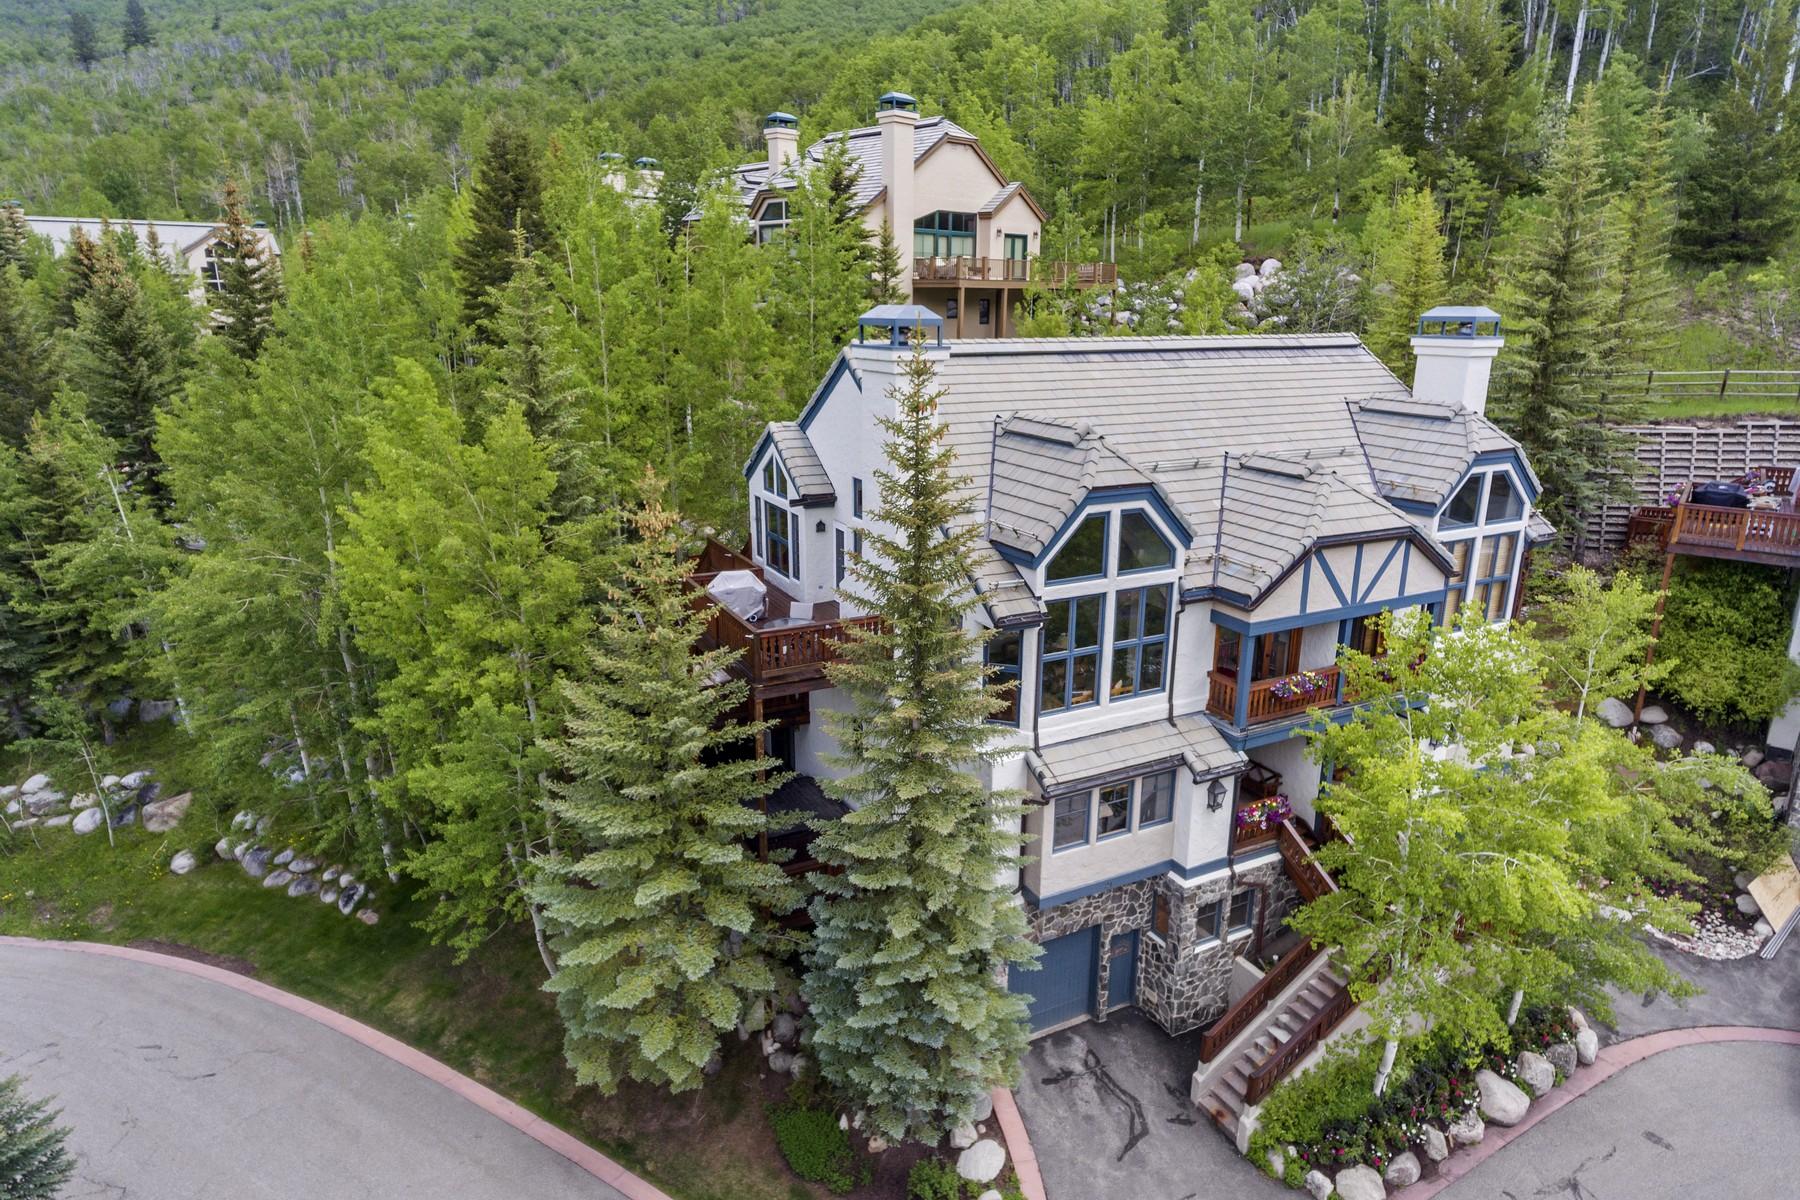 townhouses για την Πώληση στο Haymeadows Townhome A1 21 Meadow Court A1, Beaver Creek, Κολοραντο 81620 Ηνωμένες Πολιτείες